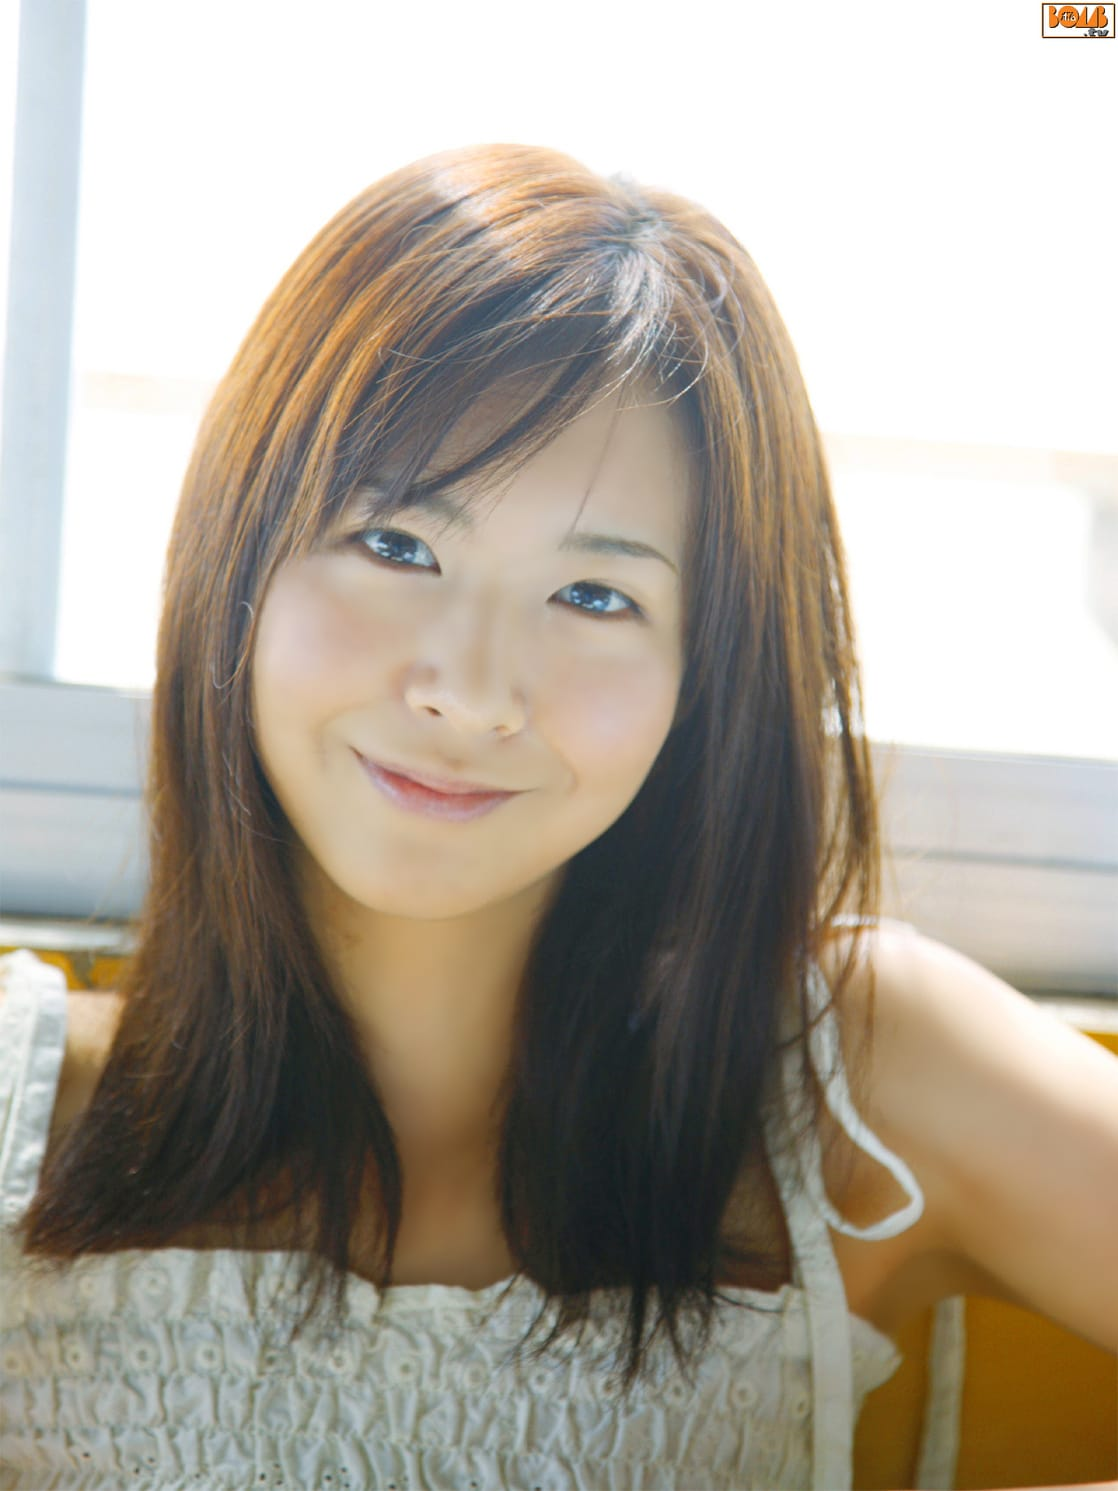 Sayuri Iwata - Alchetron, The Free Social Encyclopedia